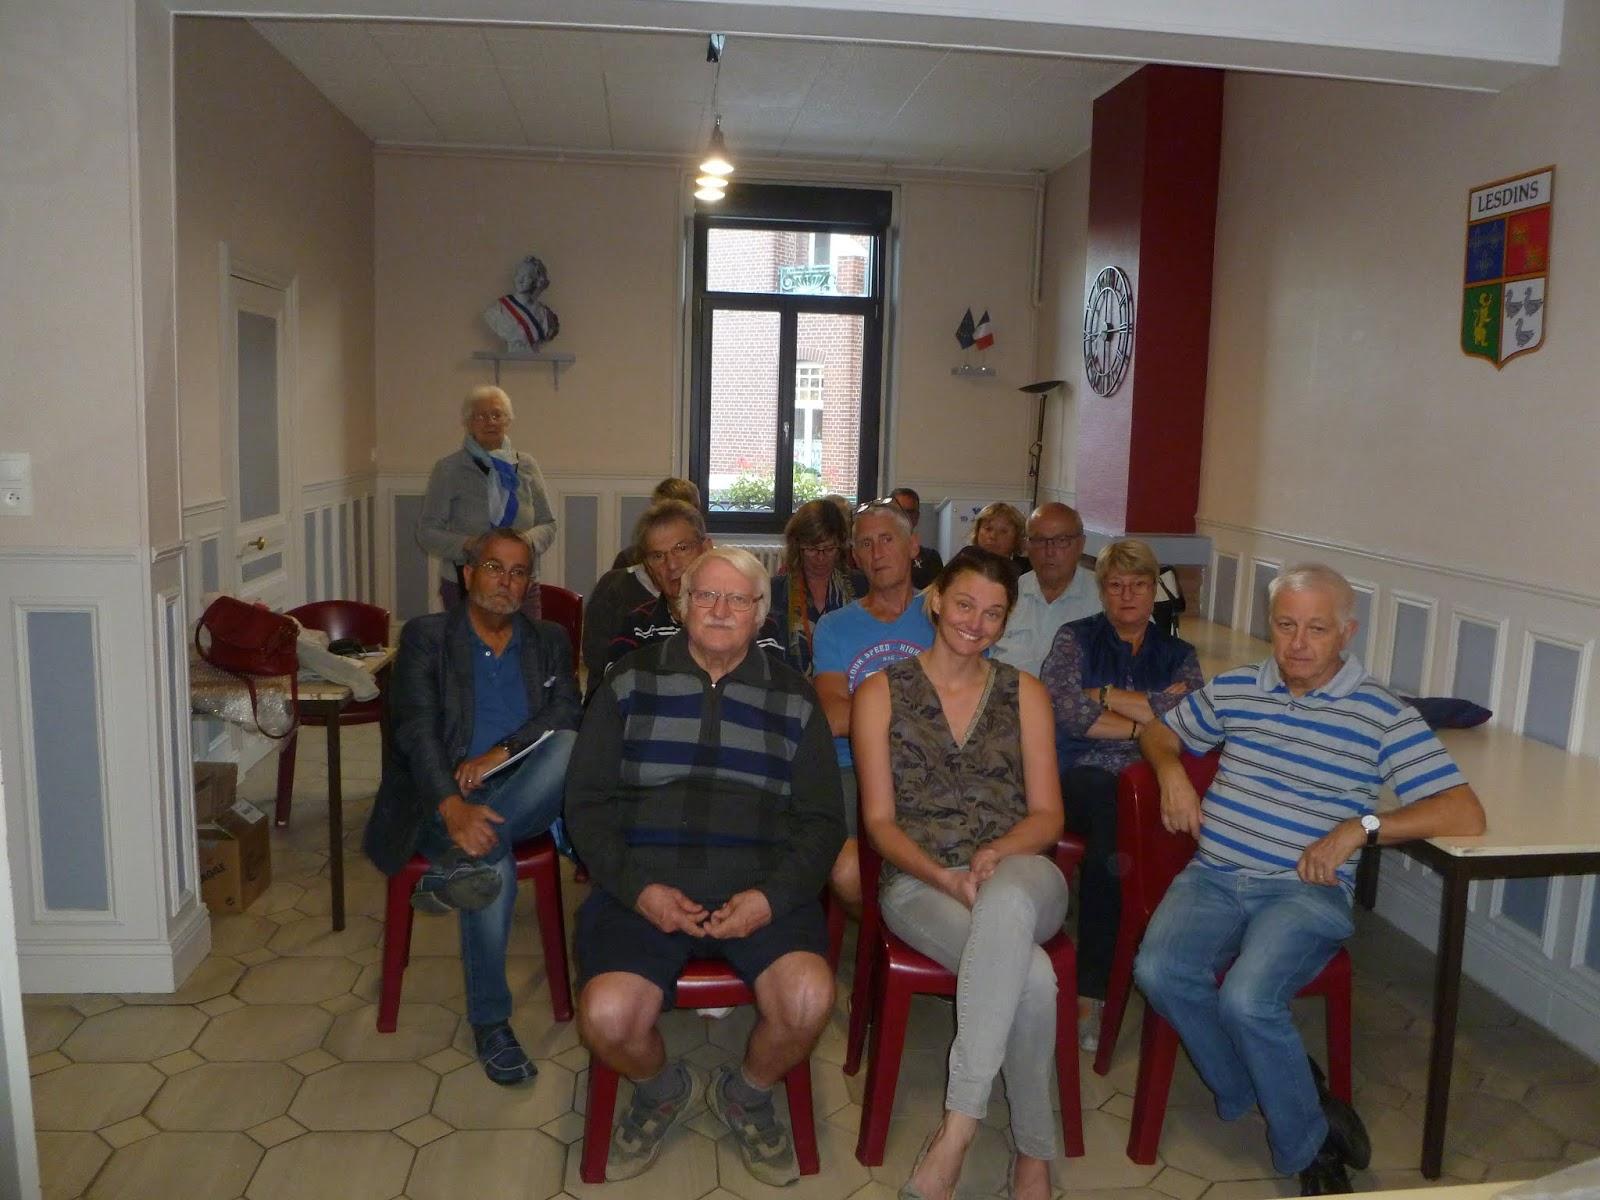 Brocante Moy De L Aisne lesdins blog infos: septembre 2019